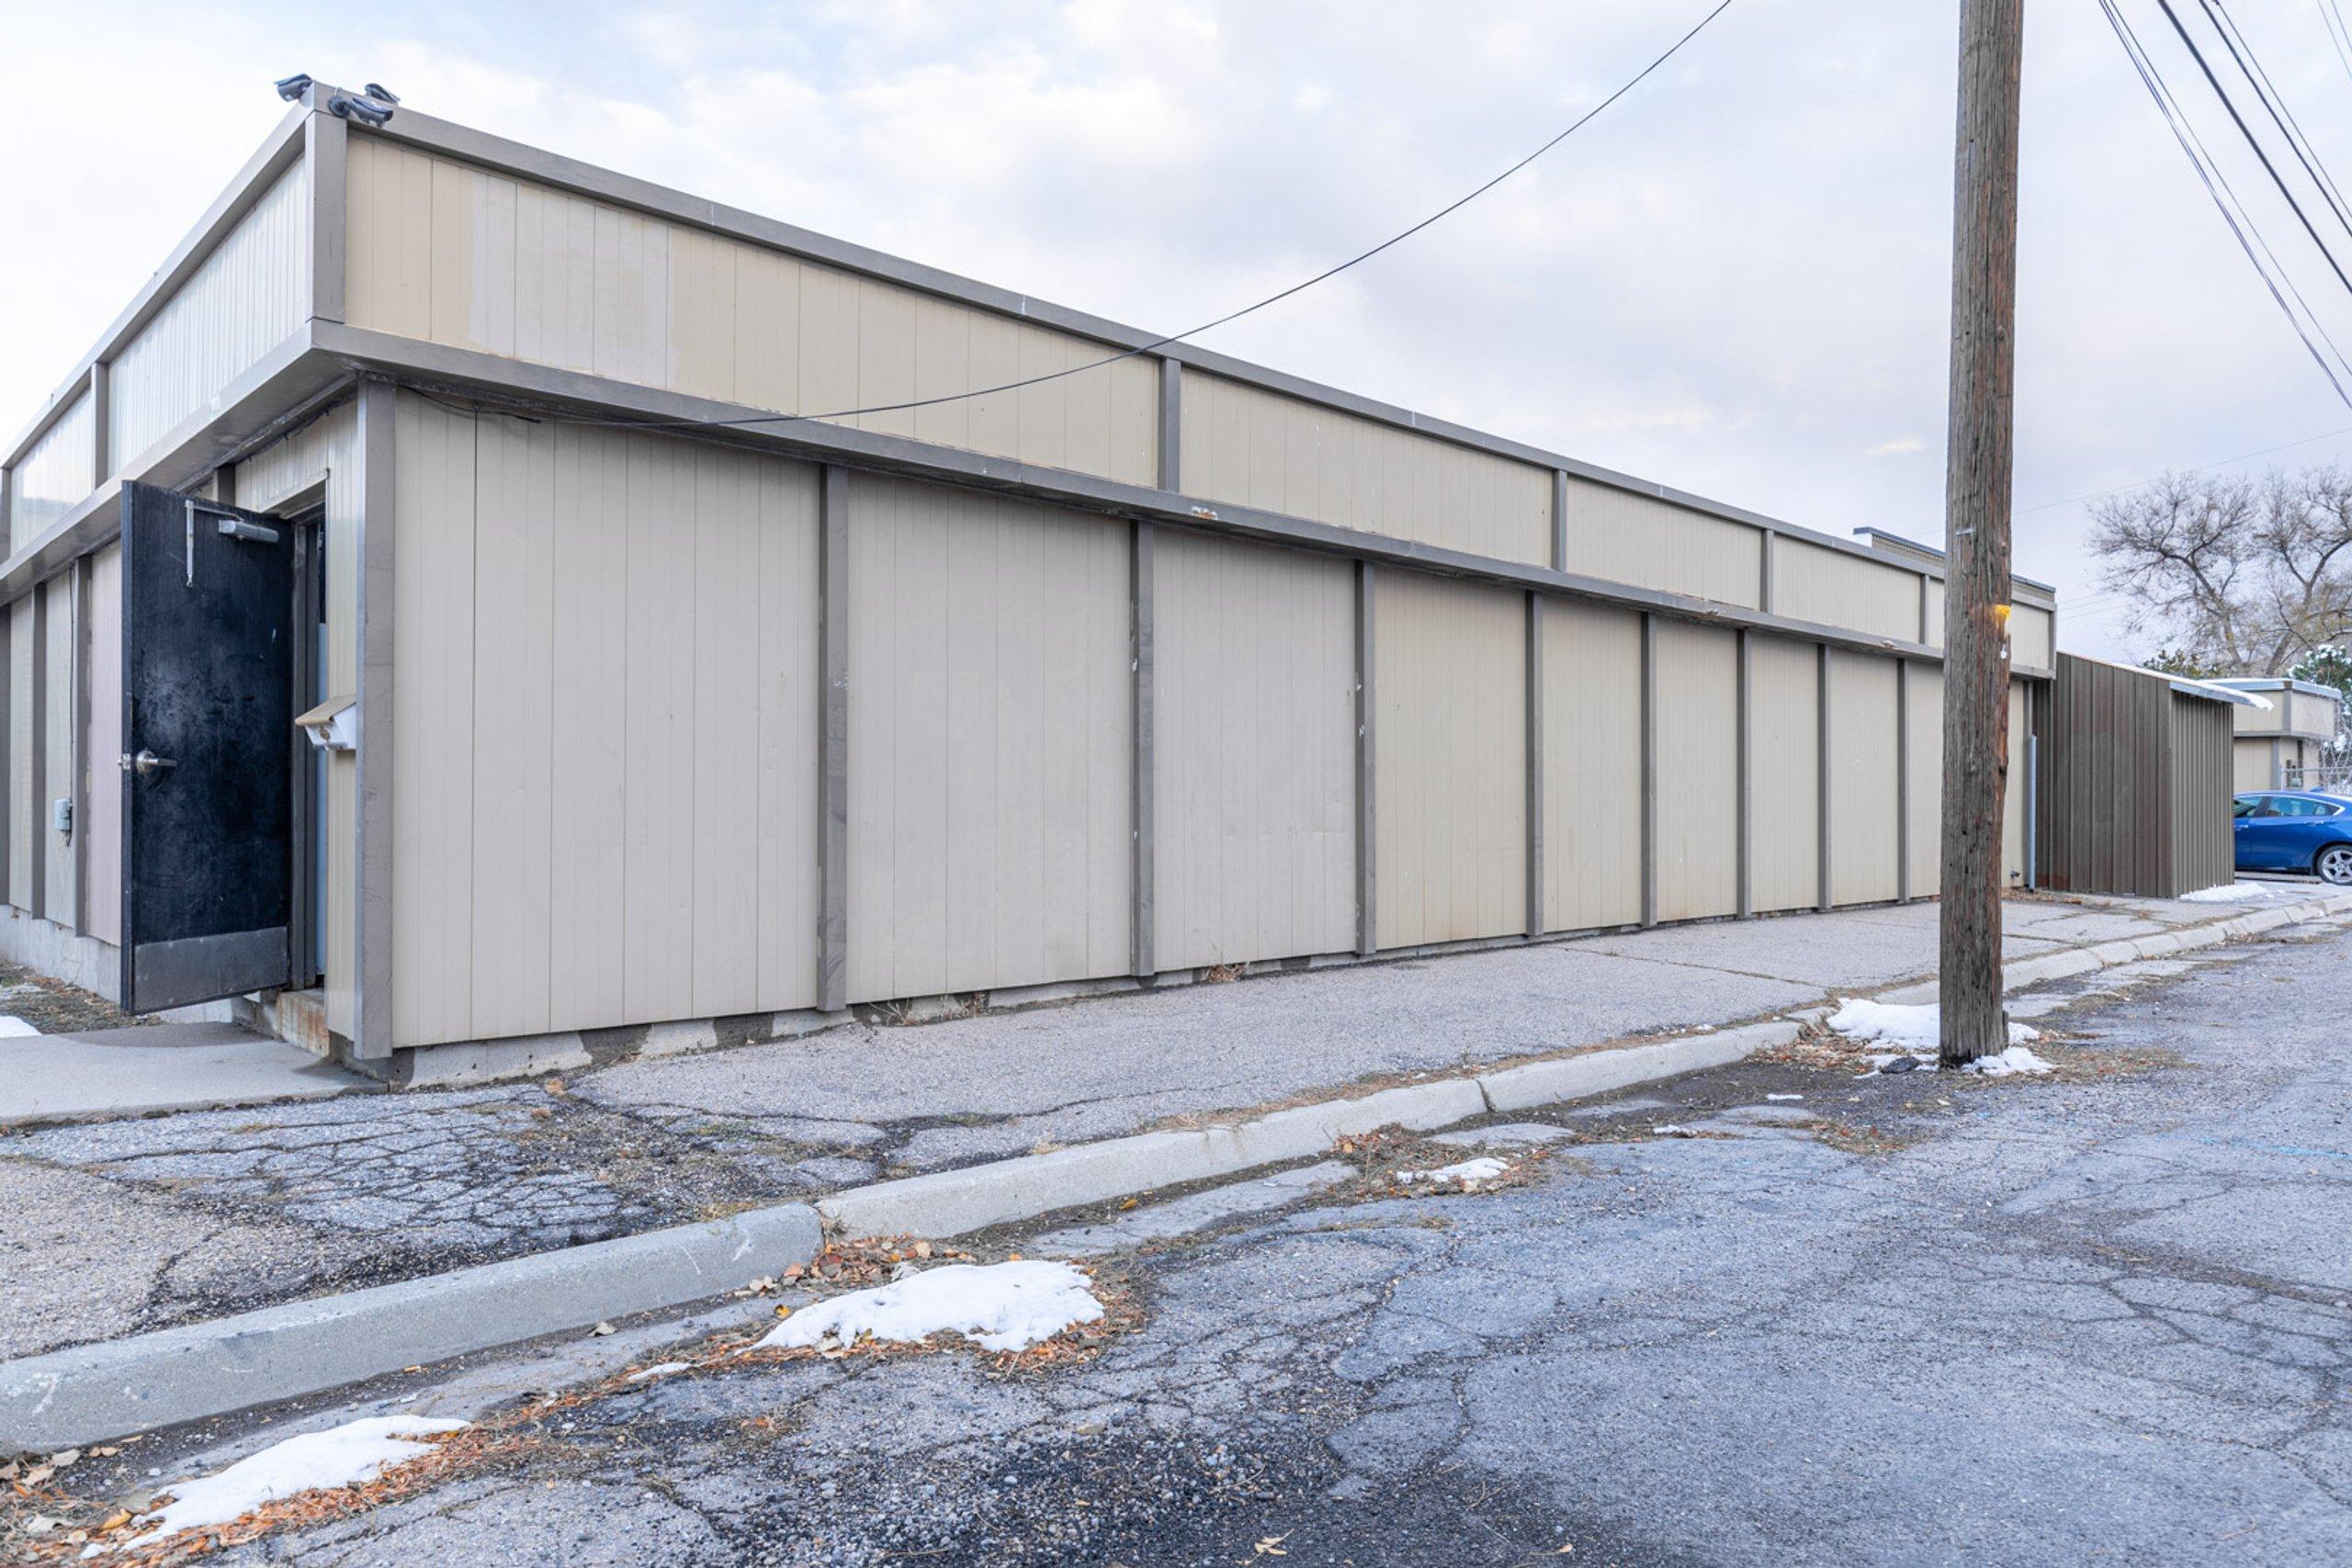 20x7 Parking Lot self storage unit